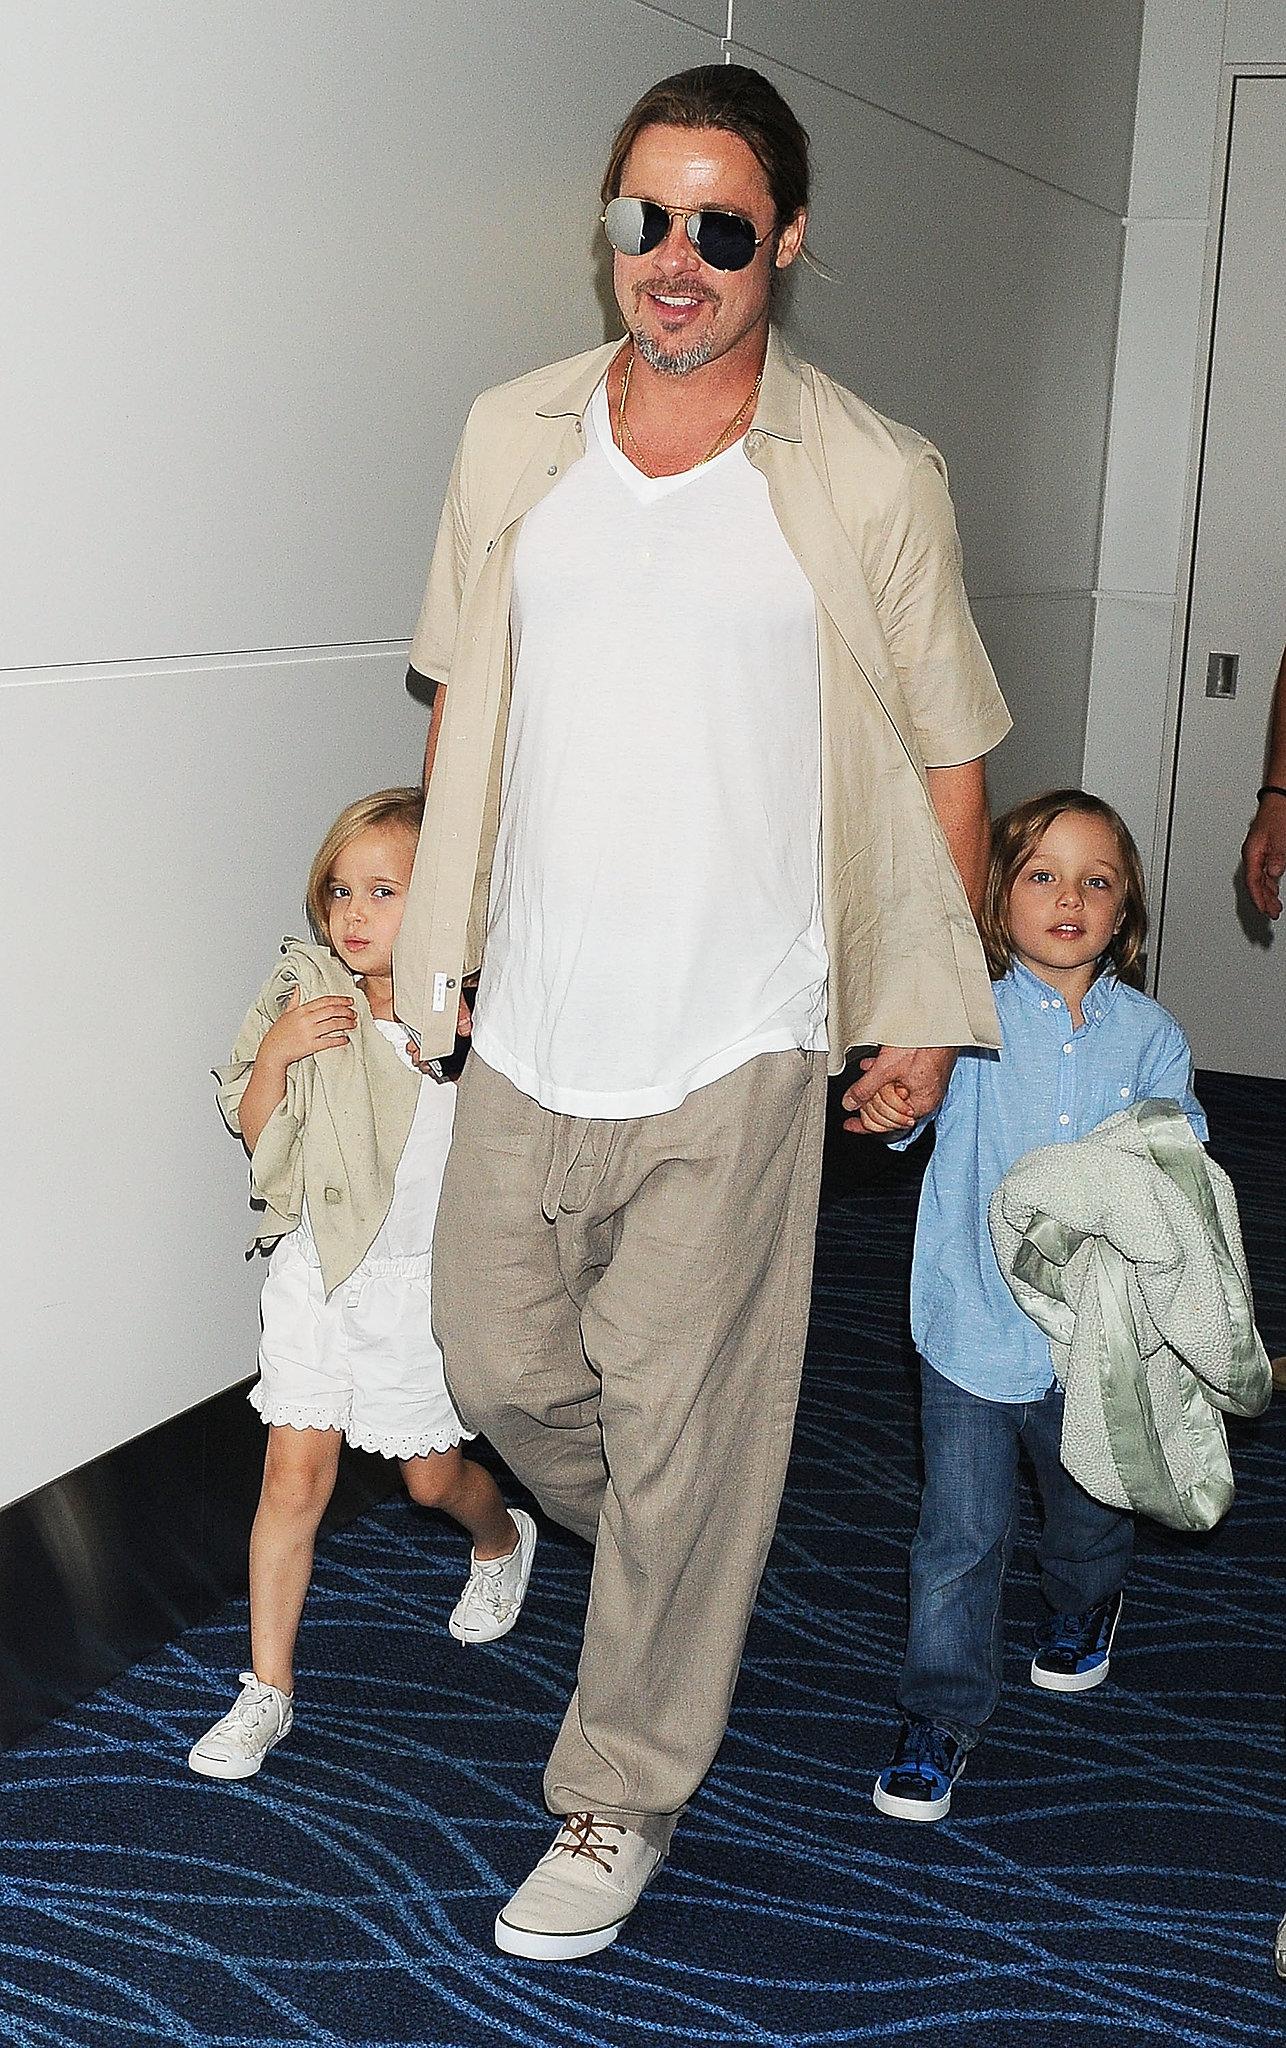 Brad Pitt smiled while walking with his kids.